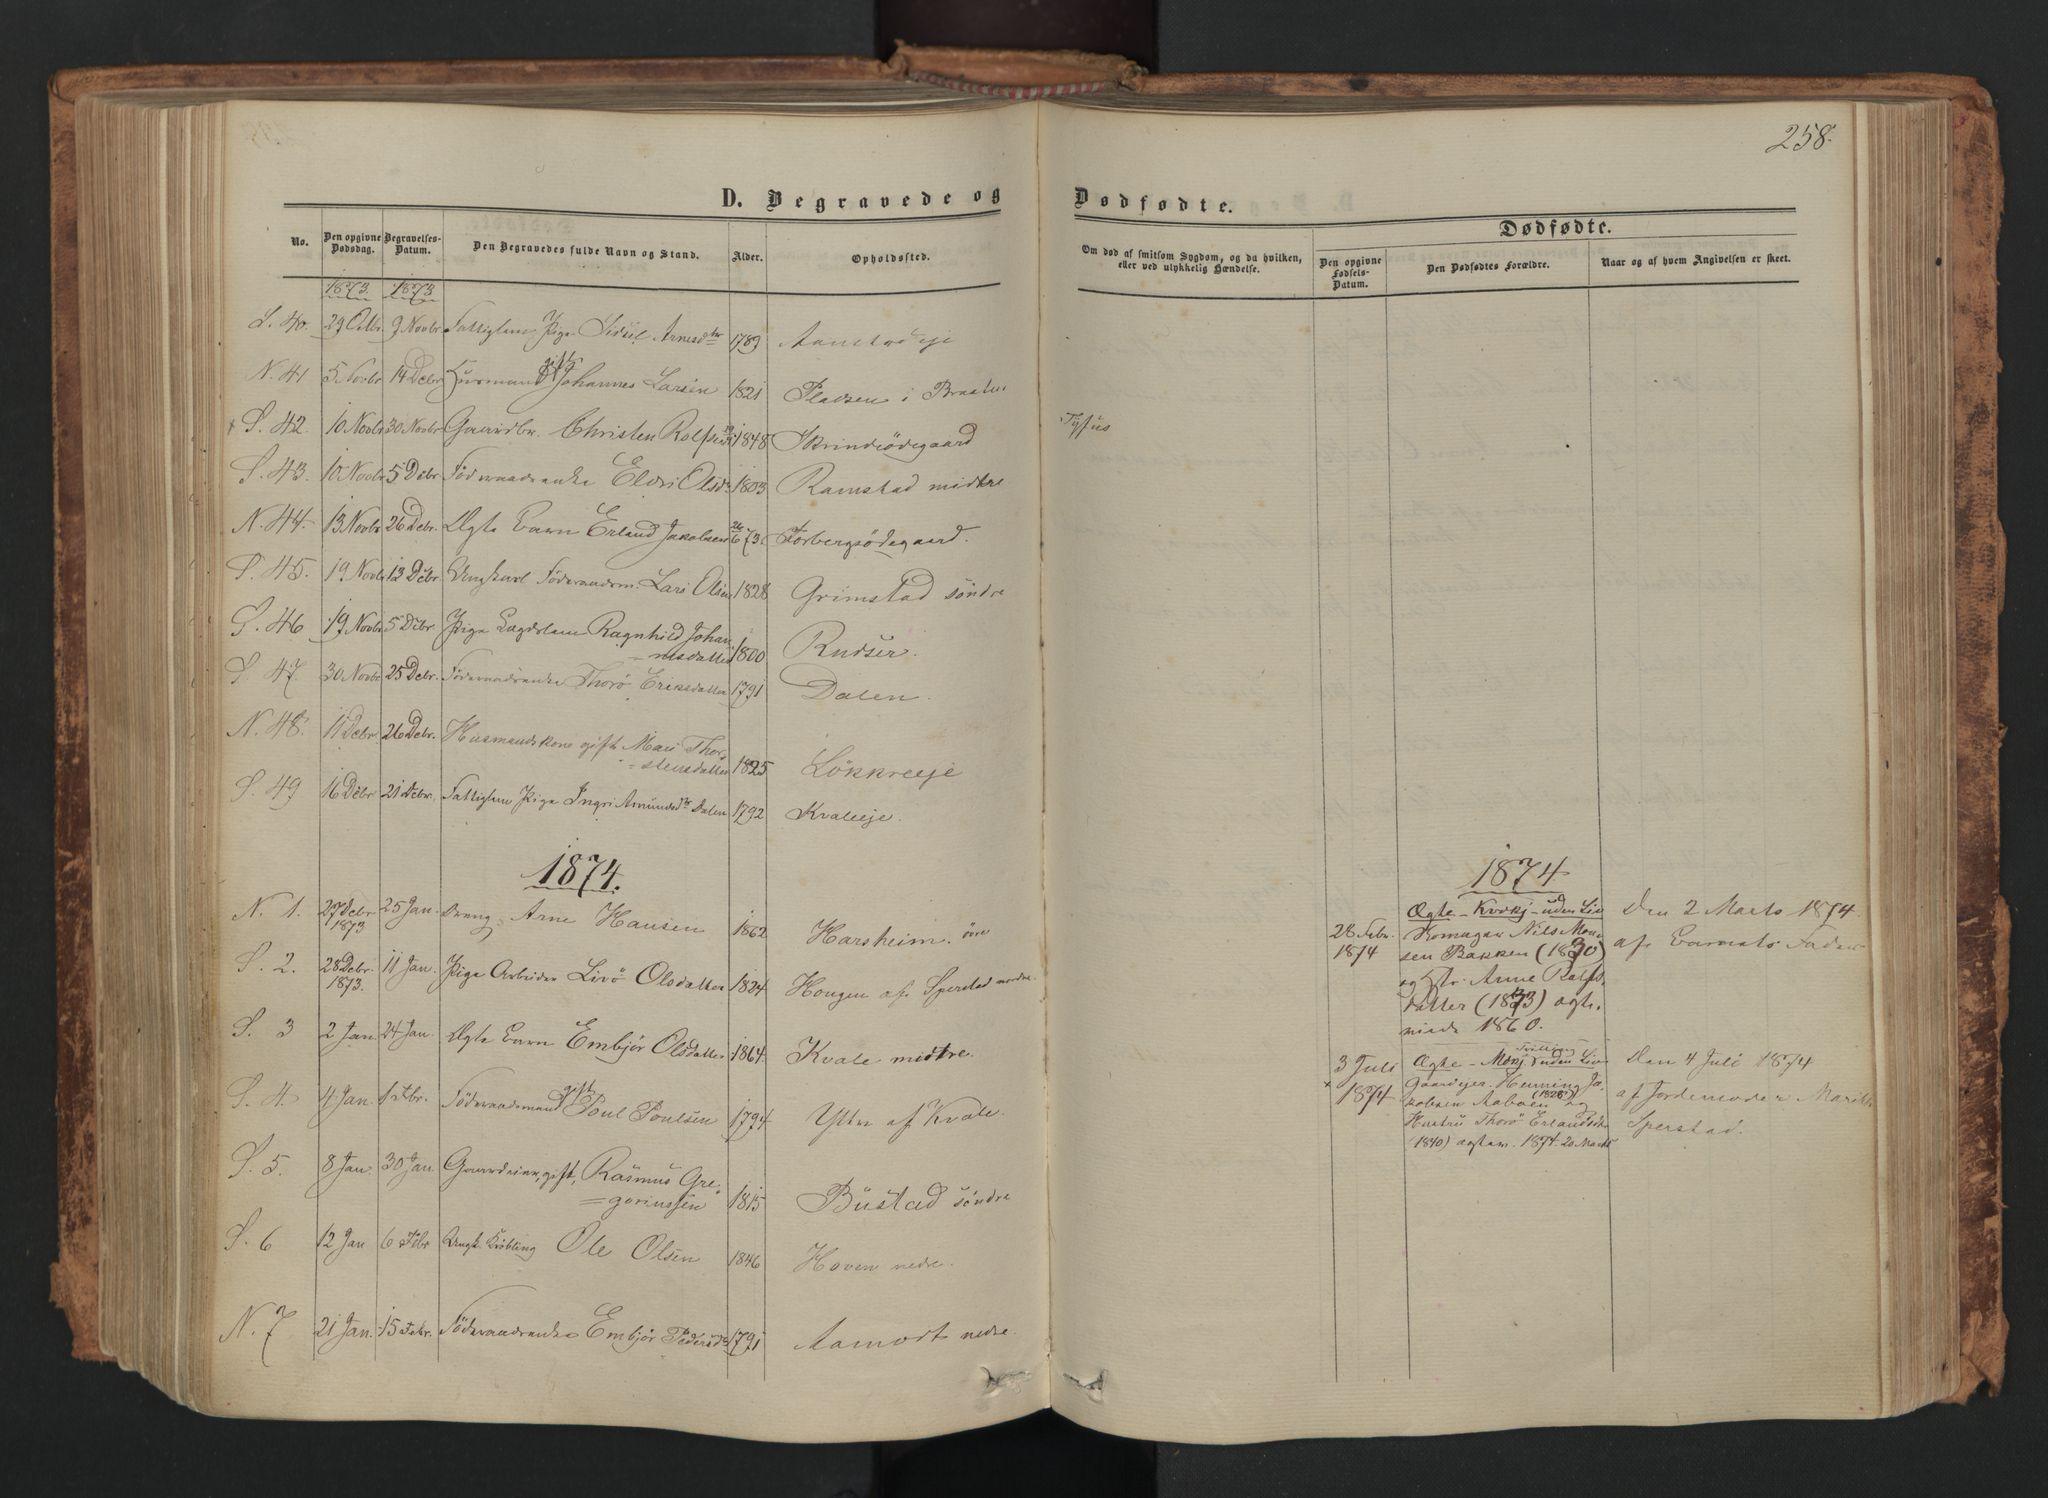 SAH, Skjåk prestekontor, Ministerialbok nr. 1, 1863-1879, s. 258